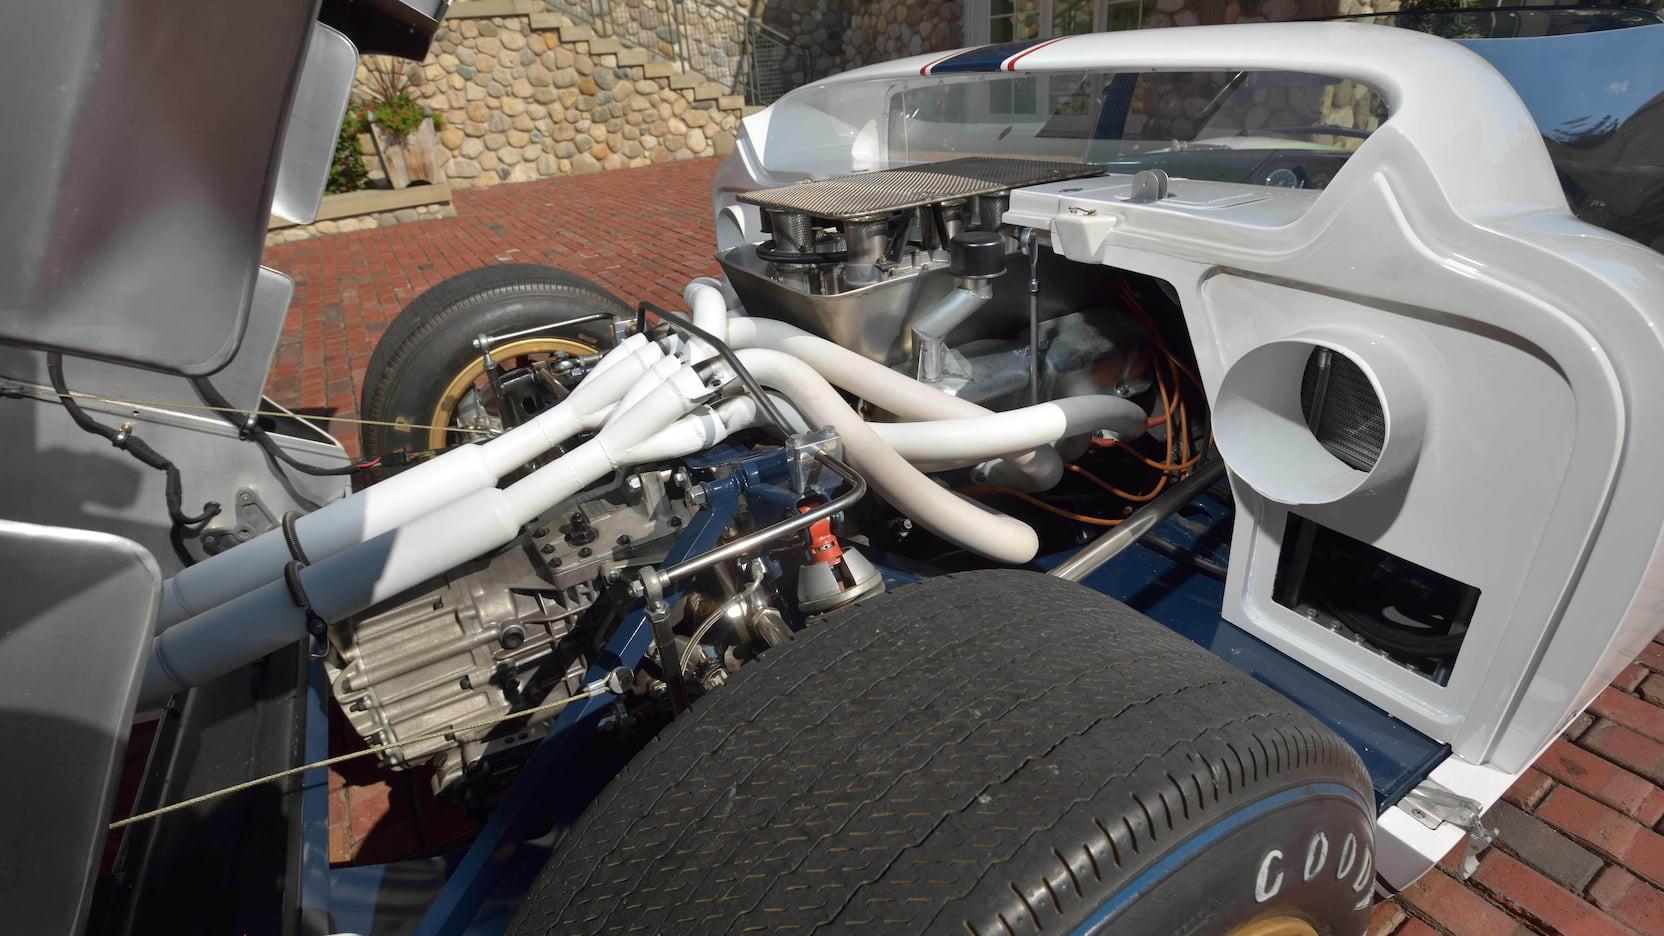 Ford GT Roadster de vanzare - Ford GT Roadster de vanzare